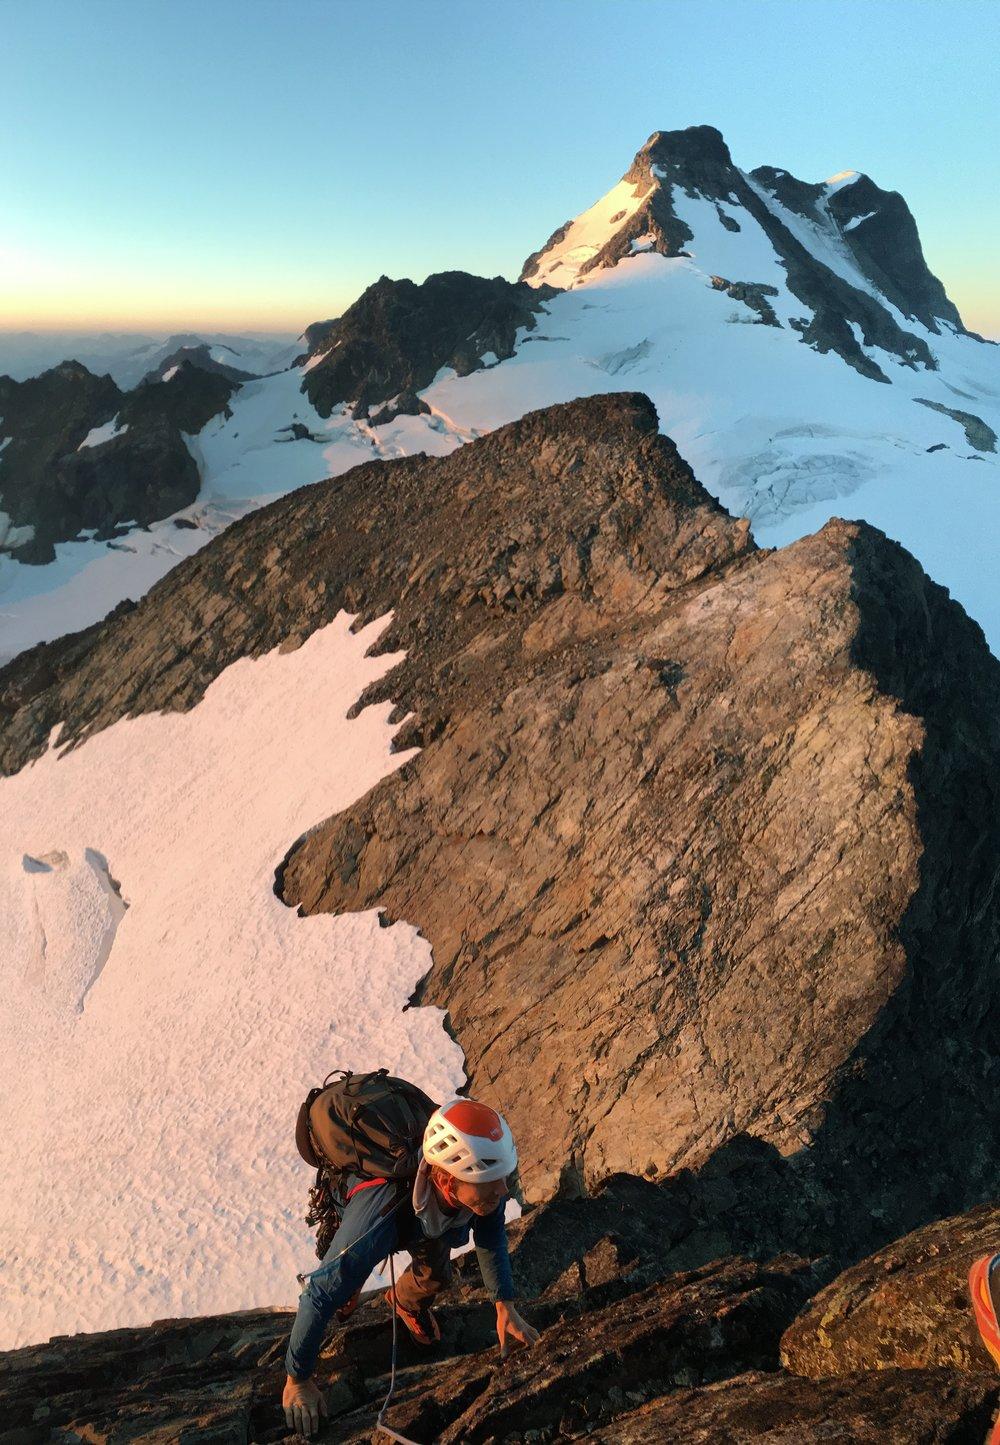 Will Gordon on the South Buttress of Joffre Peak_Photo by Dustin Portzline.JPG